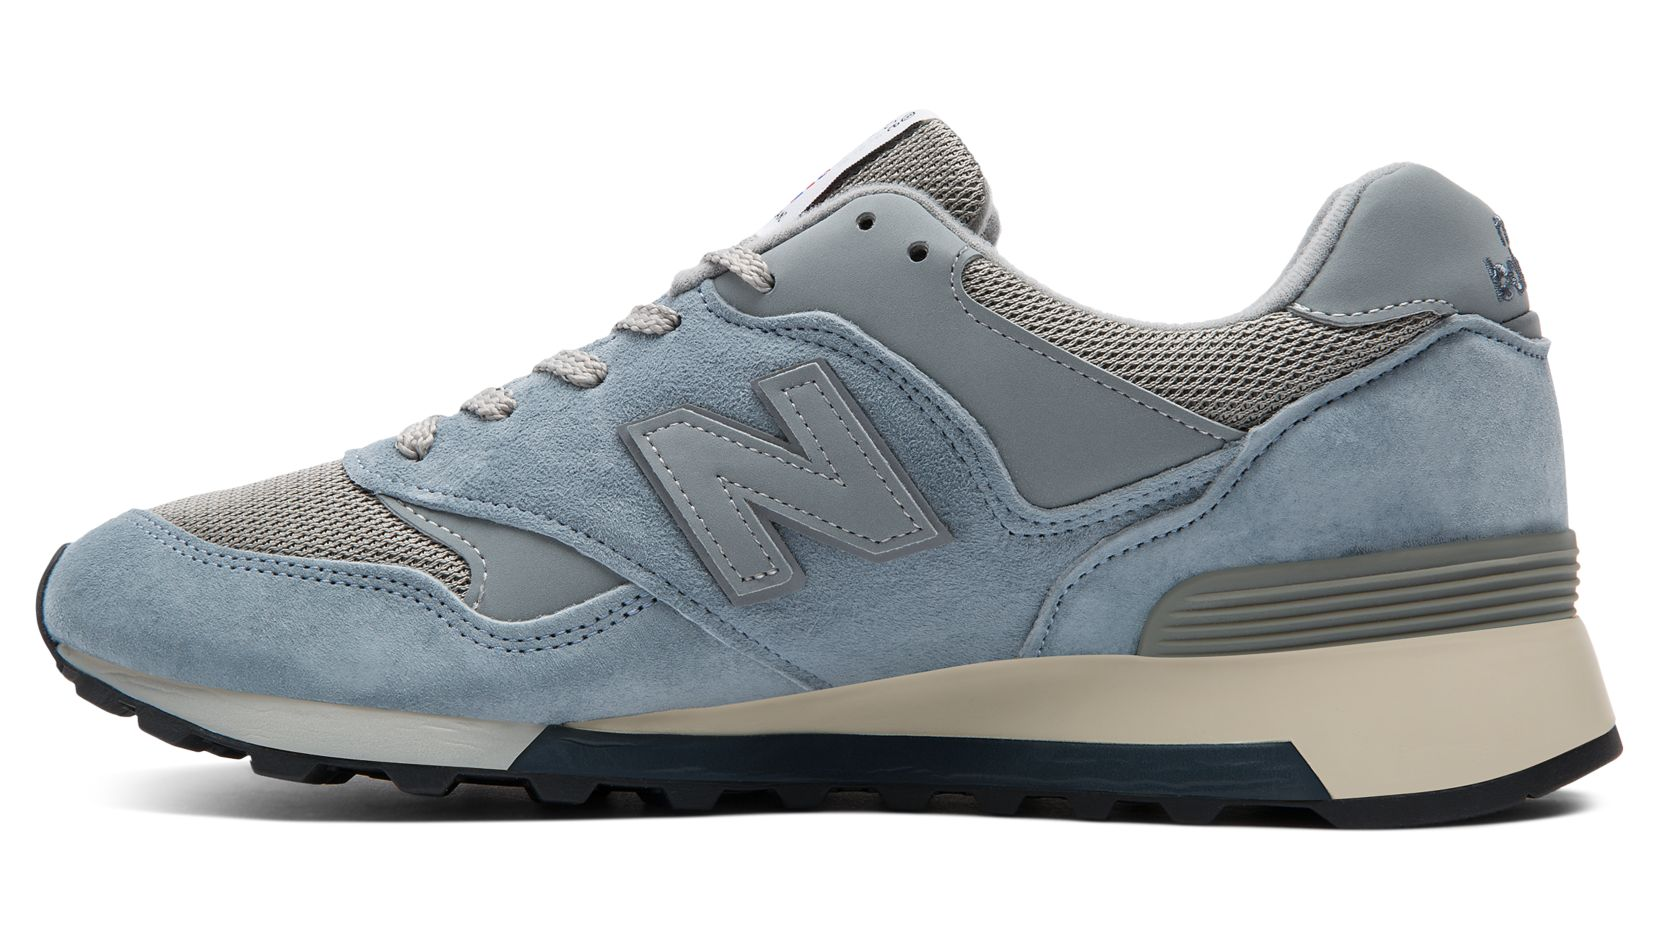 new balance 577 made in uk light grey